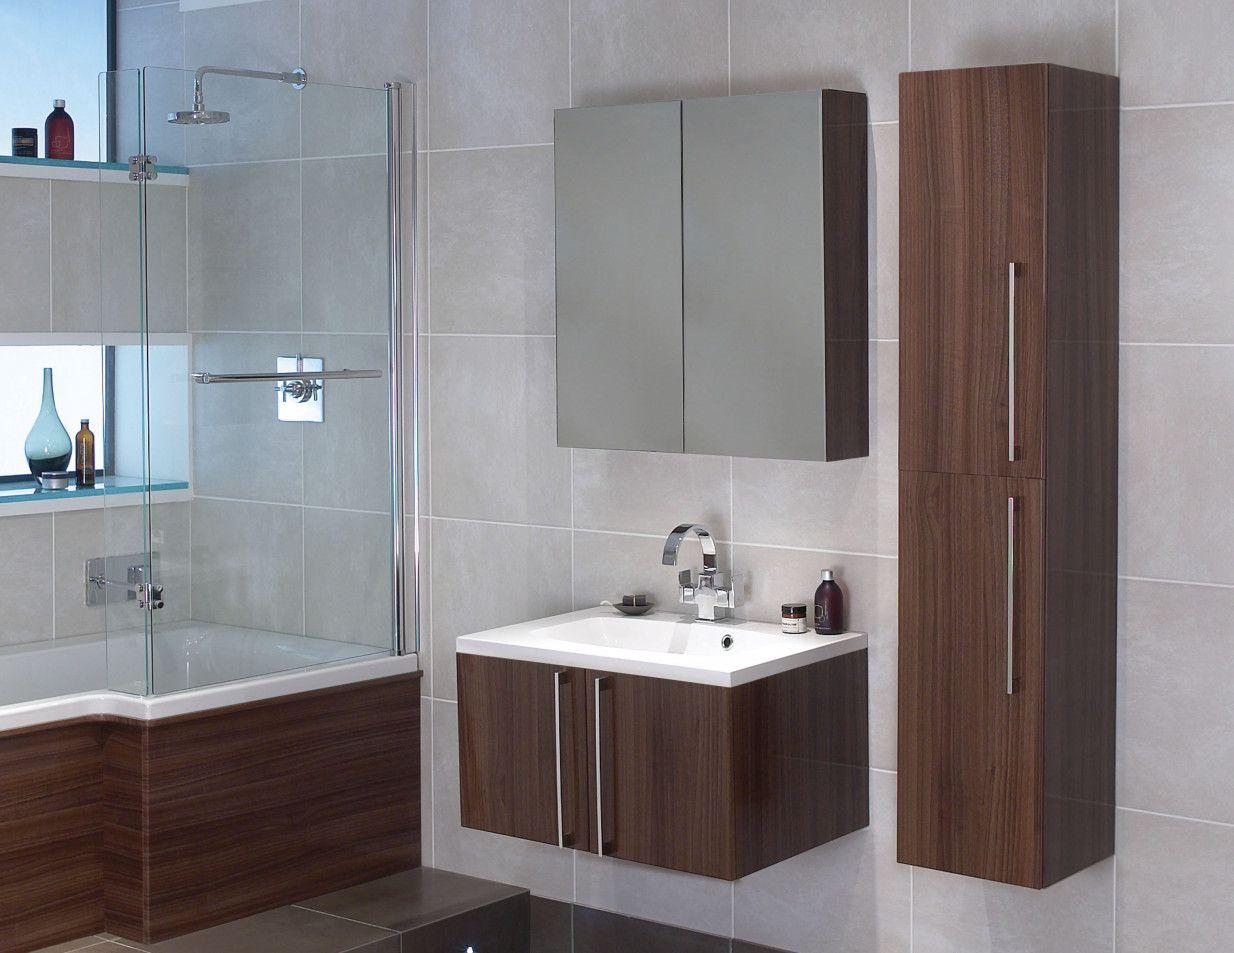 55 Dark Walnut Bathroom Cabinet Most Popular Interior Paint Colors Check More Bathroom Corner Storage Bathroom Wall Cabinets Bathroom Corner Storage Cabinet